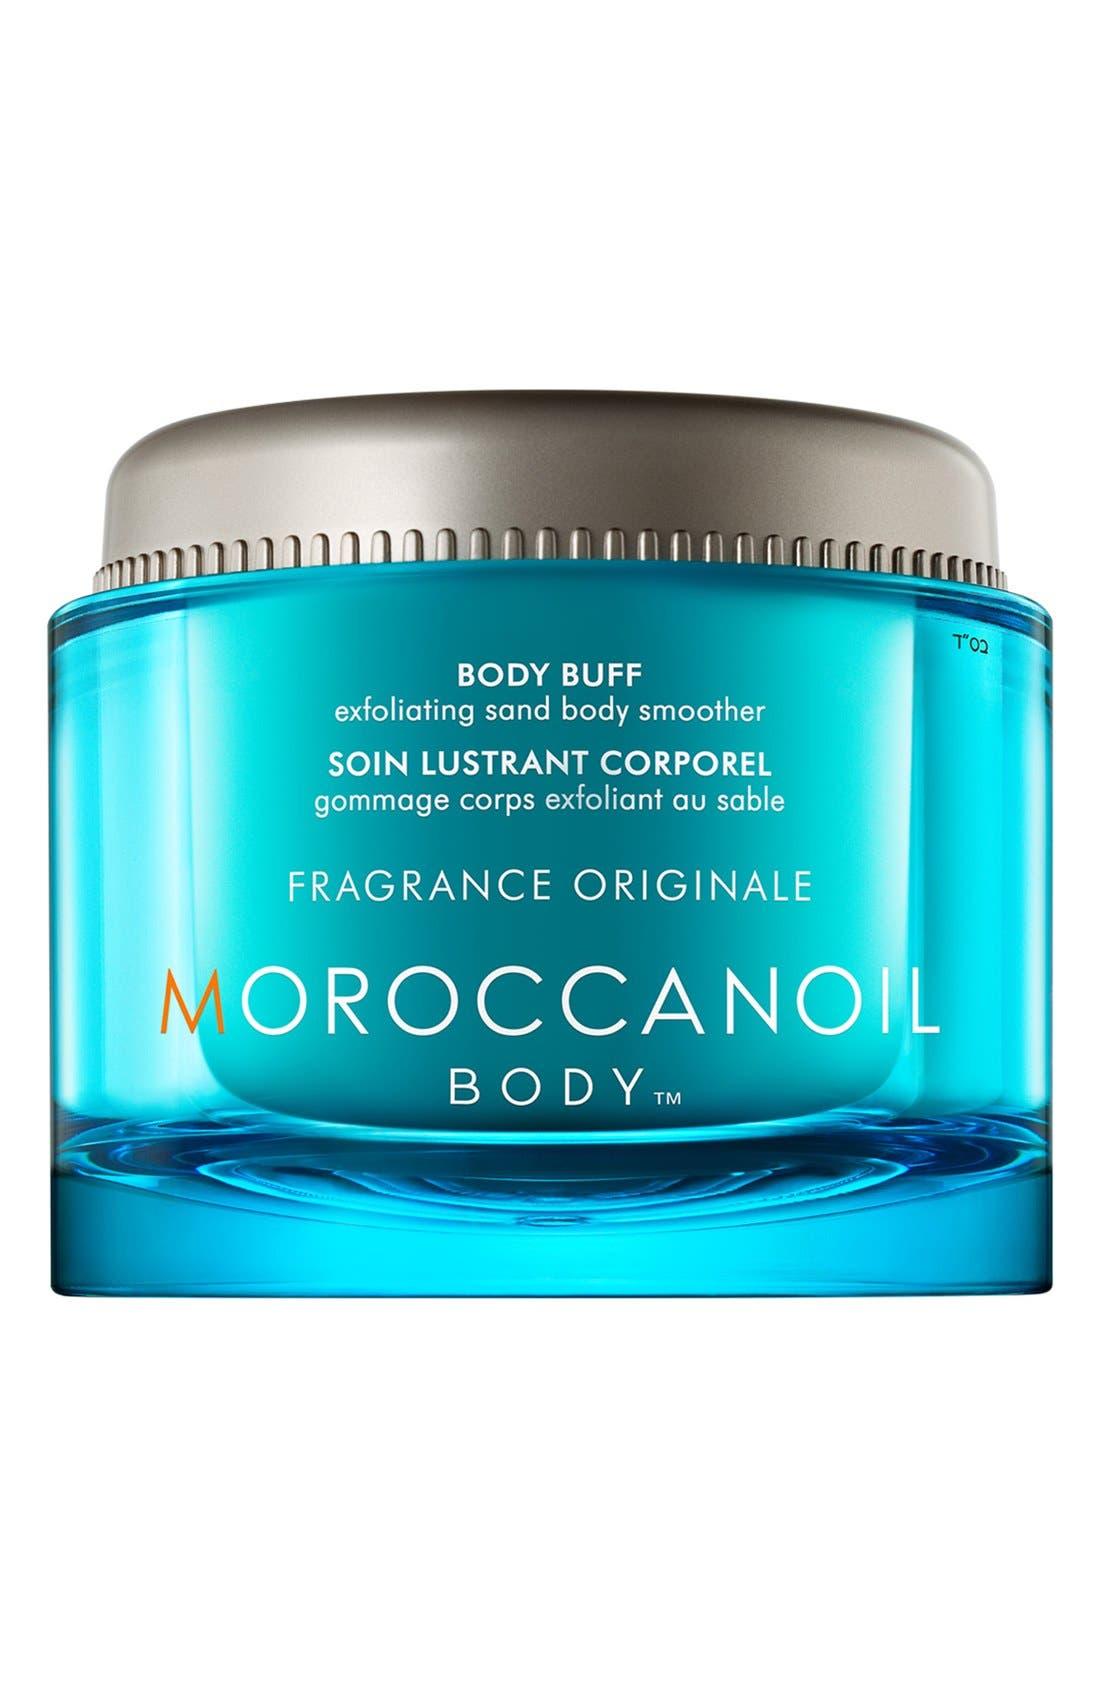 MOROCCANOIL® Body Buff